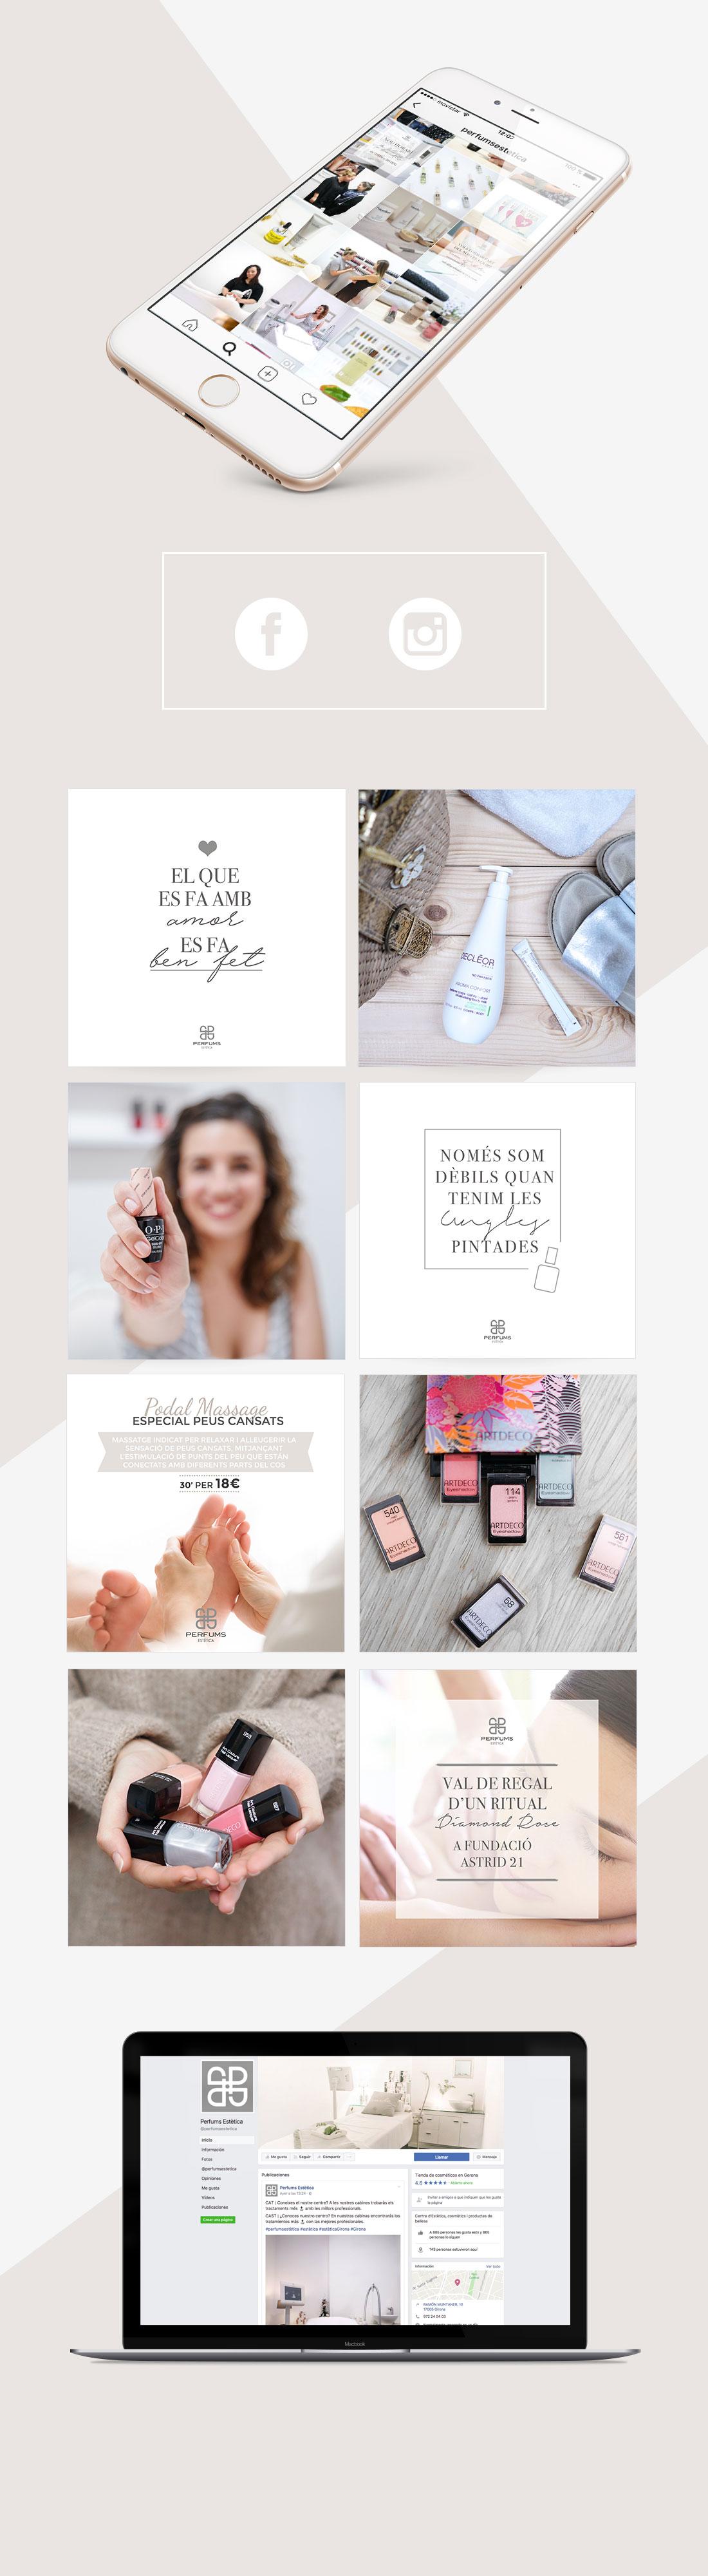 perfums---social-2